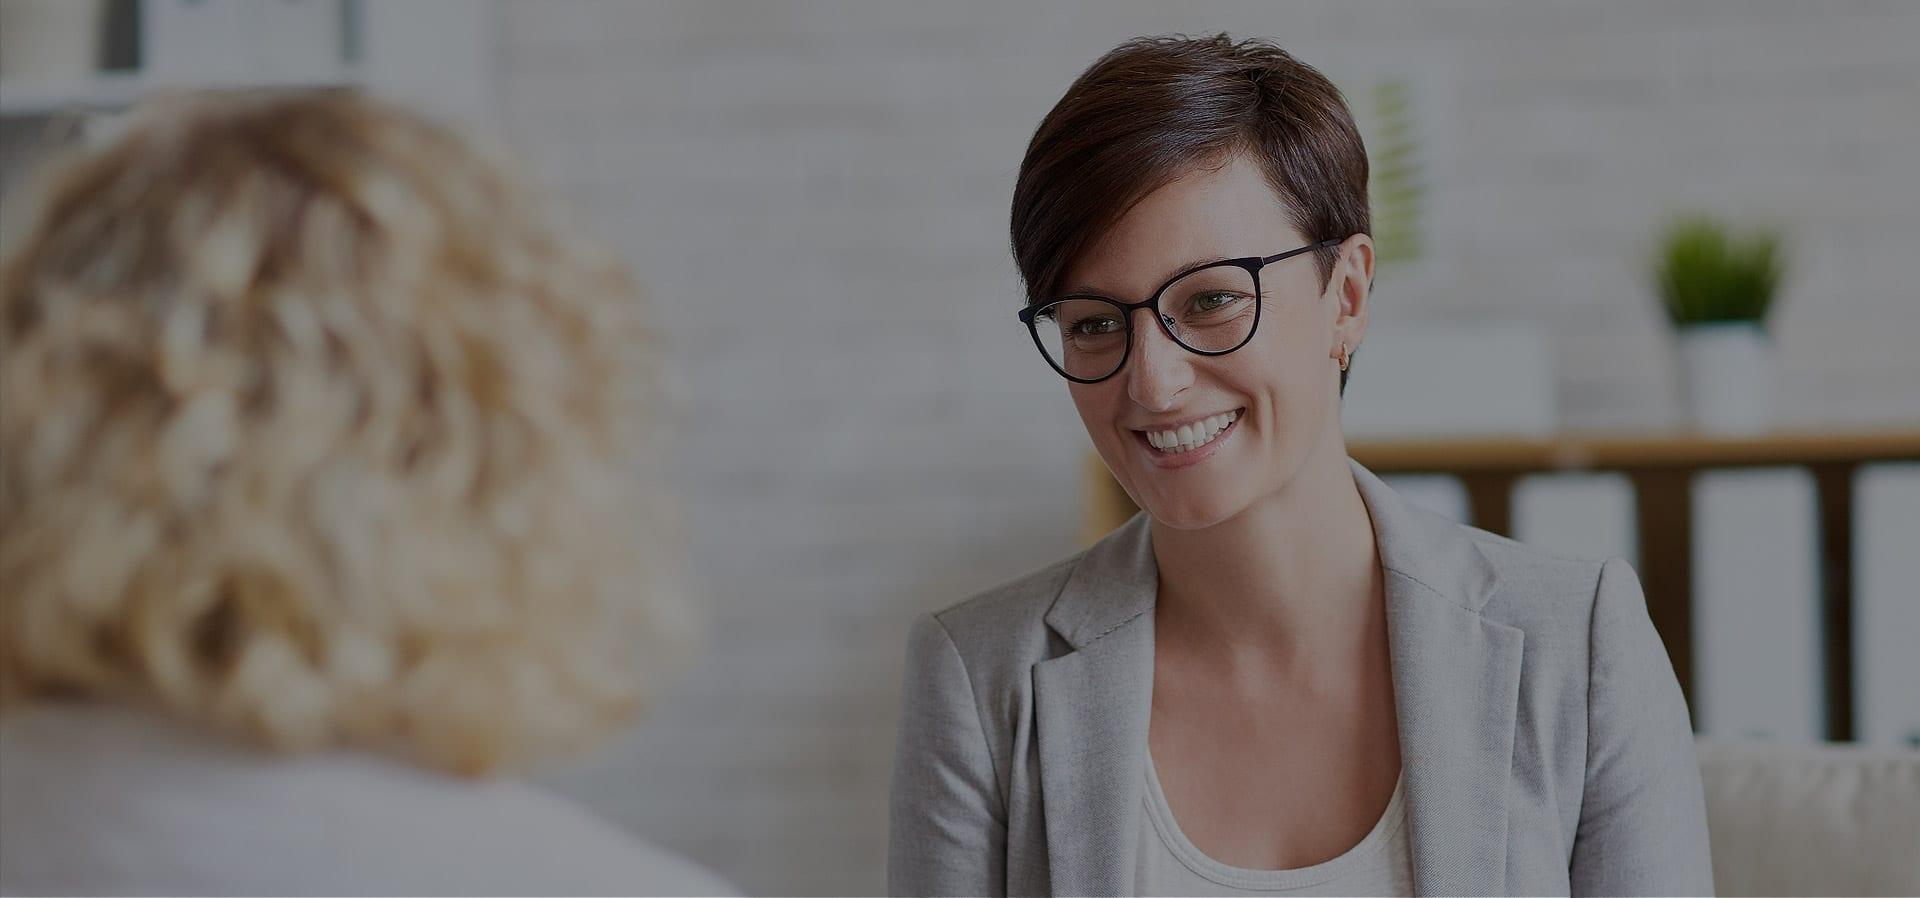 psychologist and client